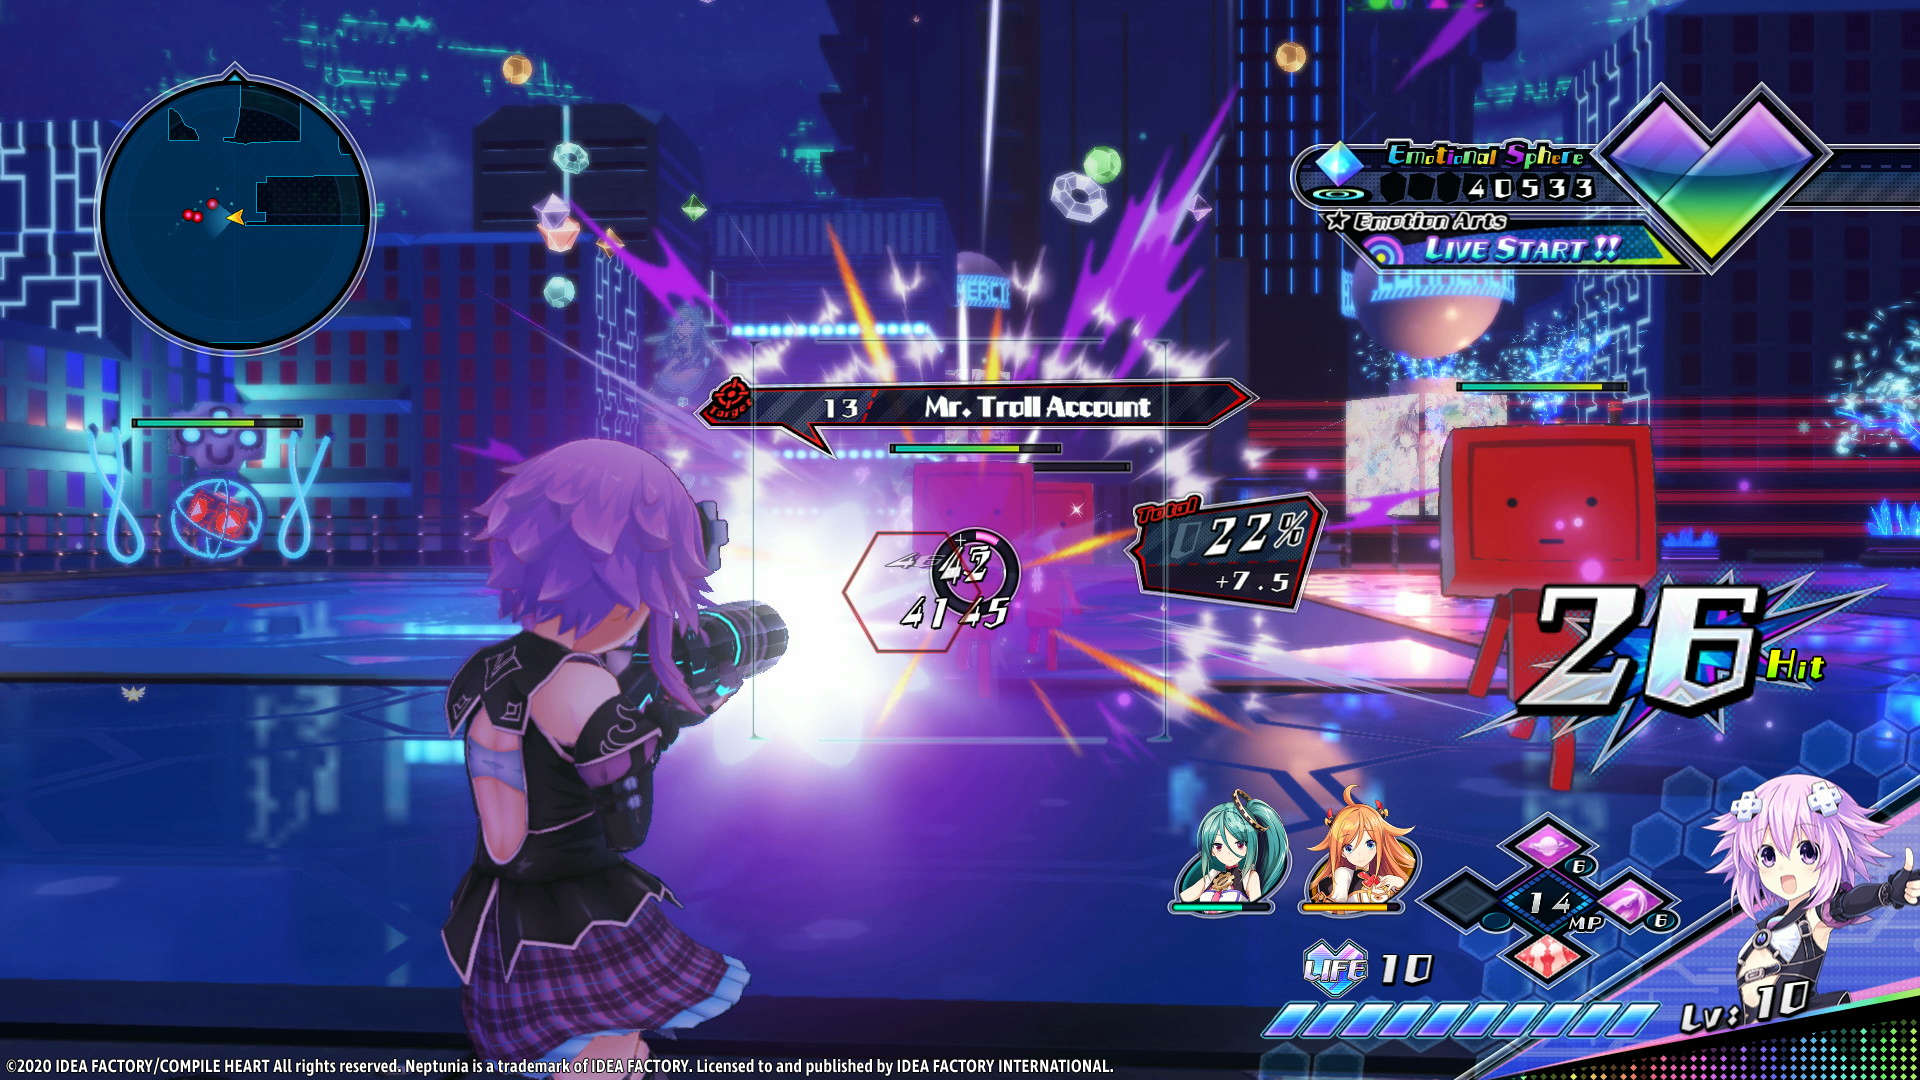 neptunia-virtual-stars-pc-screenshot-2